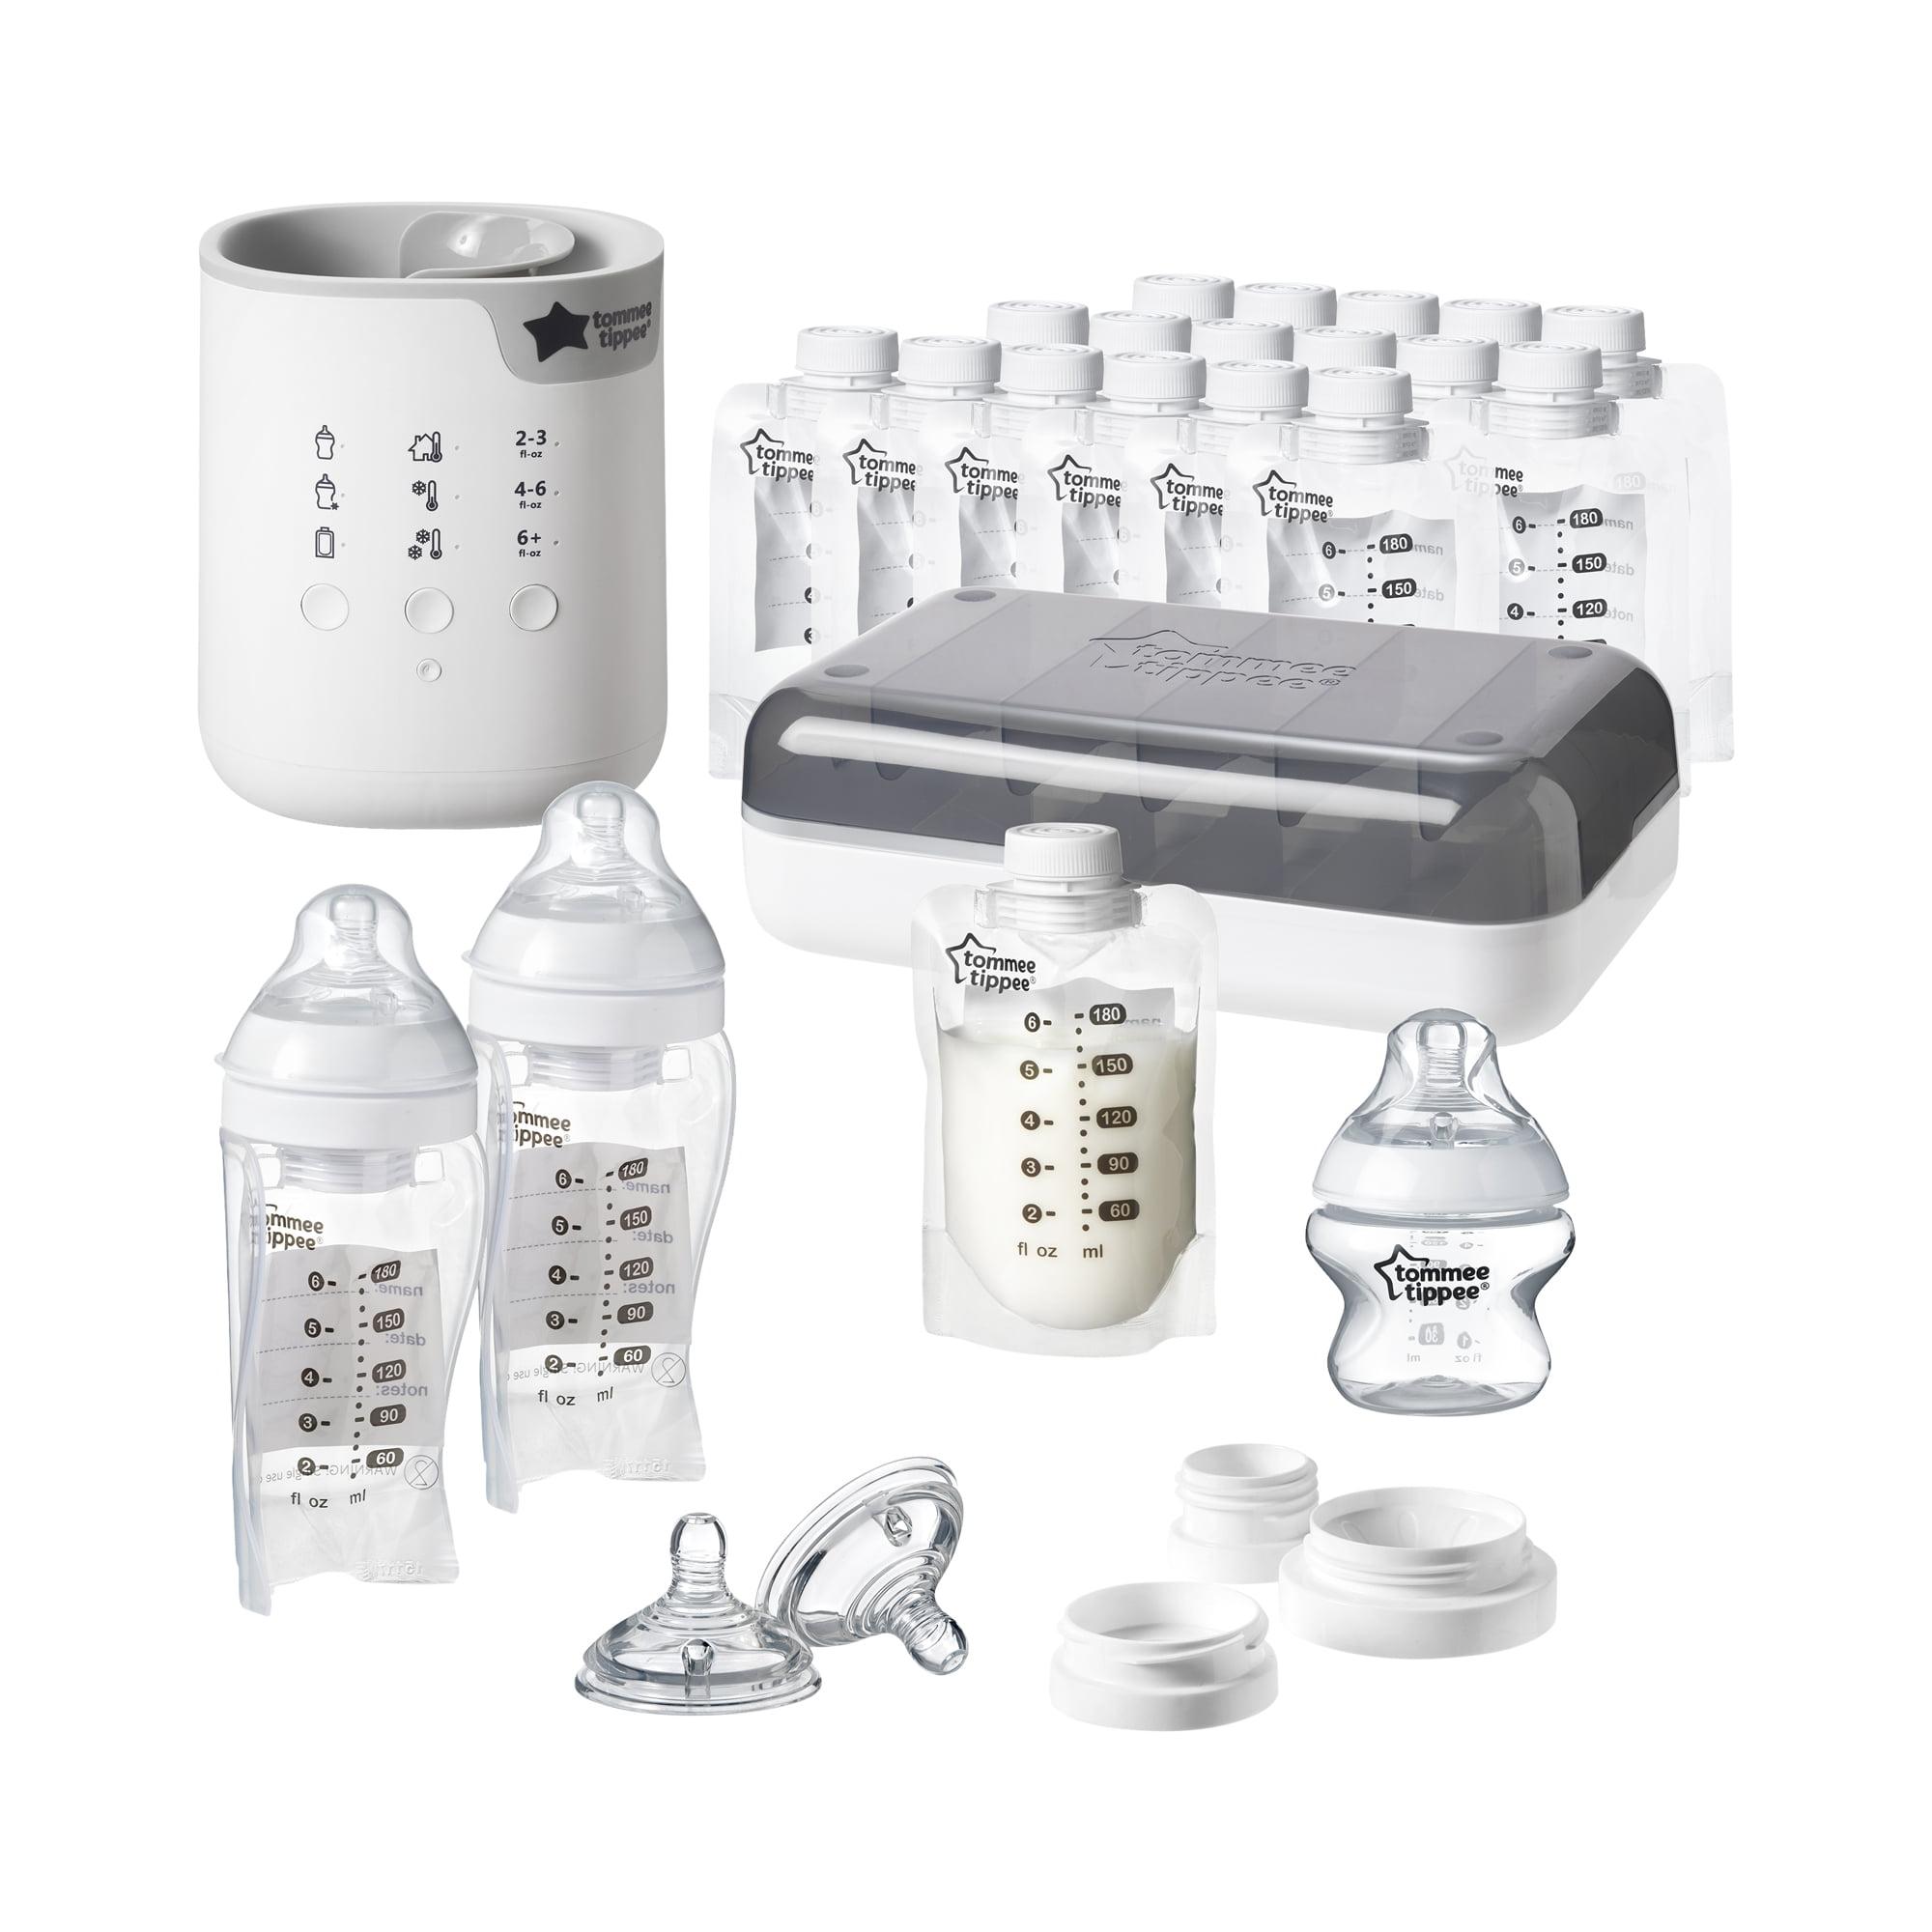 Tommee Tippee Pump & Go Complete Breast Milk Set